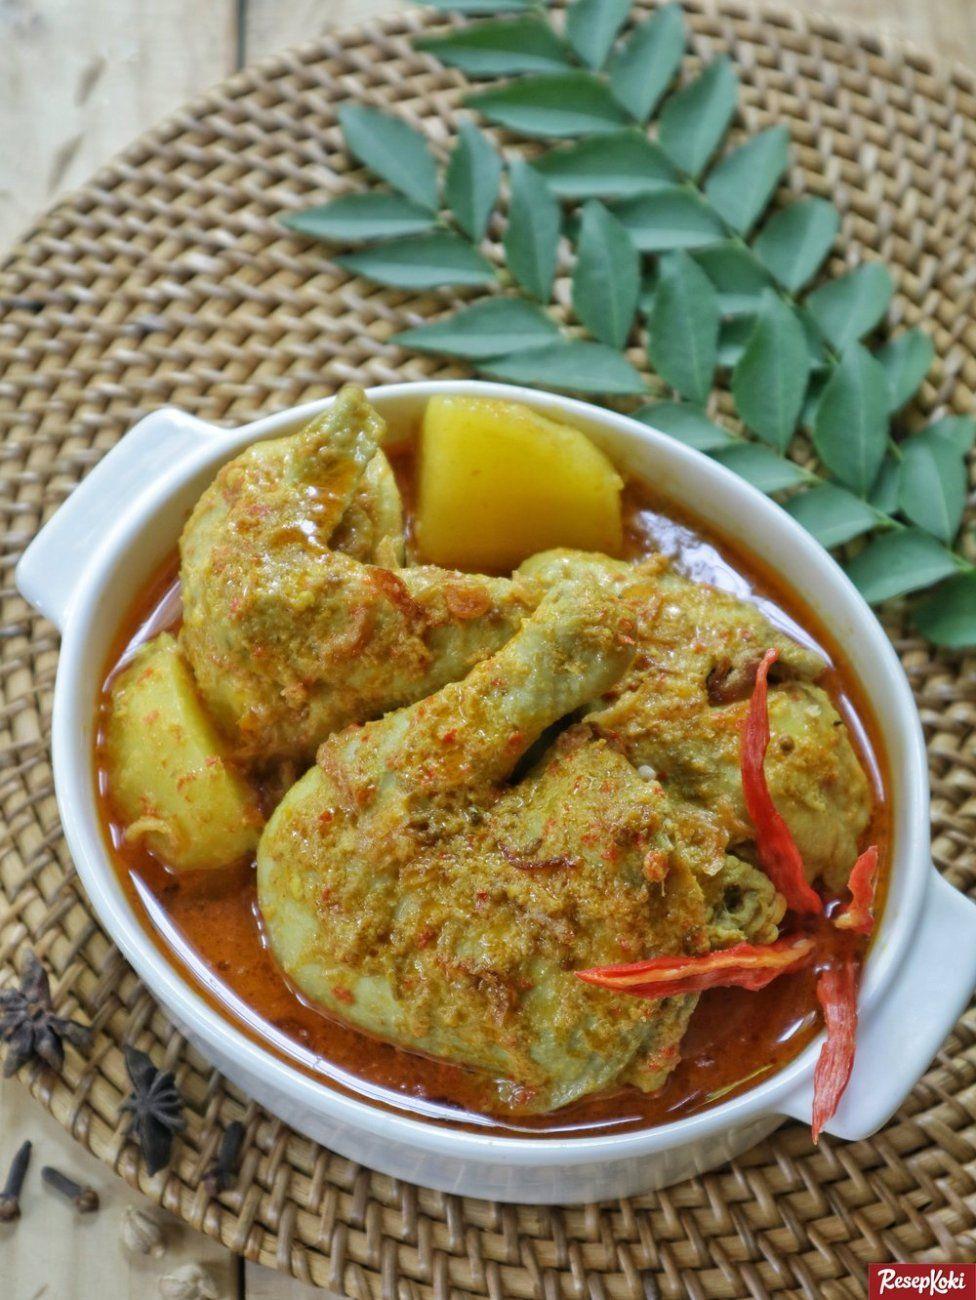 Kari Ayam Lezat Dan Sederhana Resep Resepkoki Resep Di 2020 Resep Masakan Resep Kari Ayam